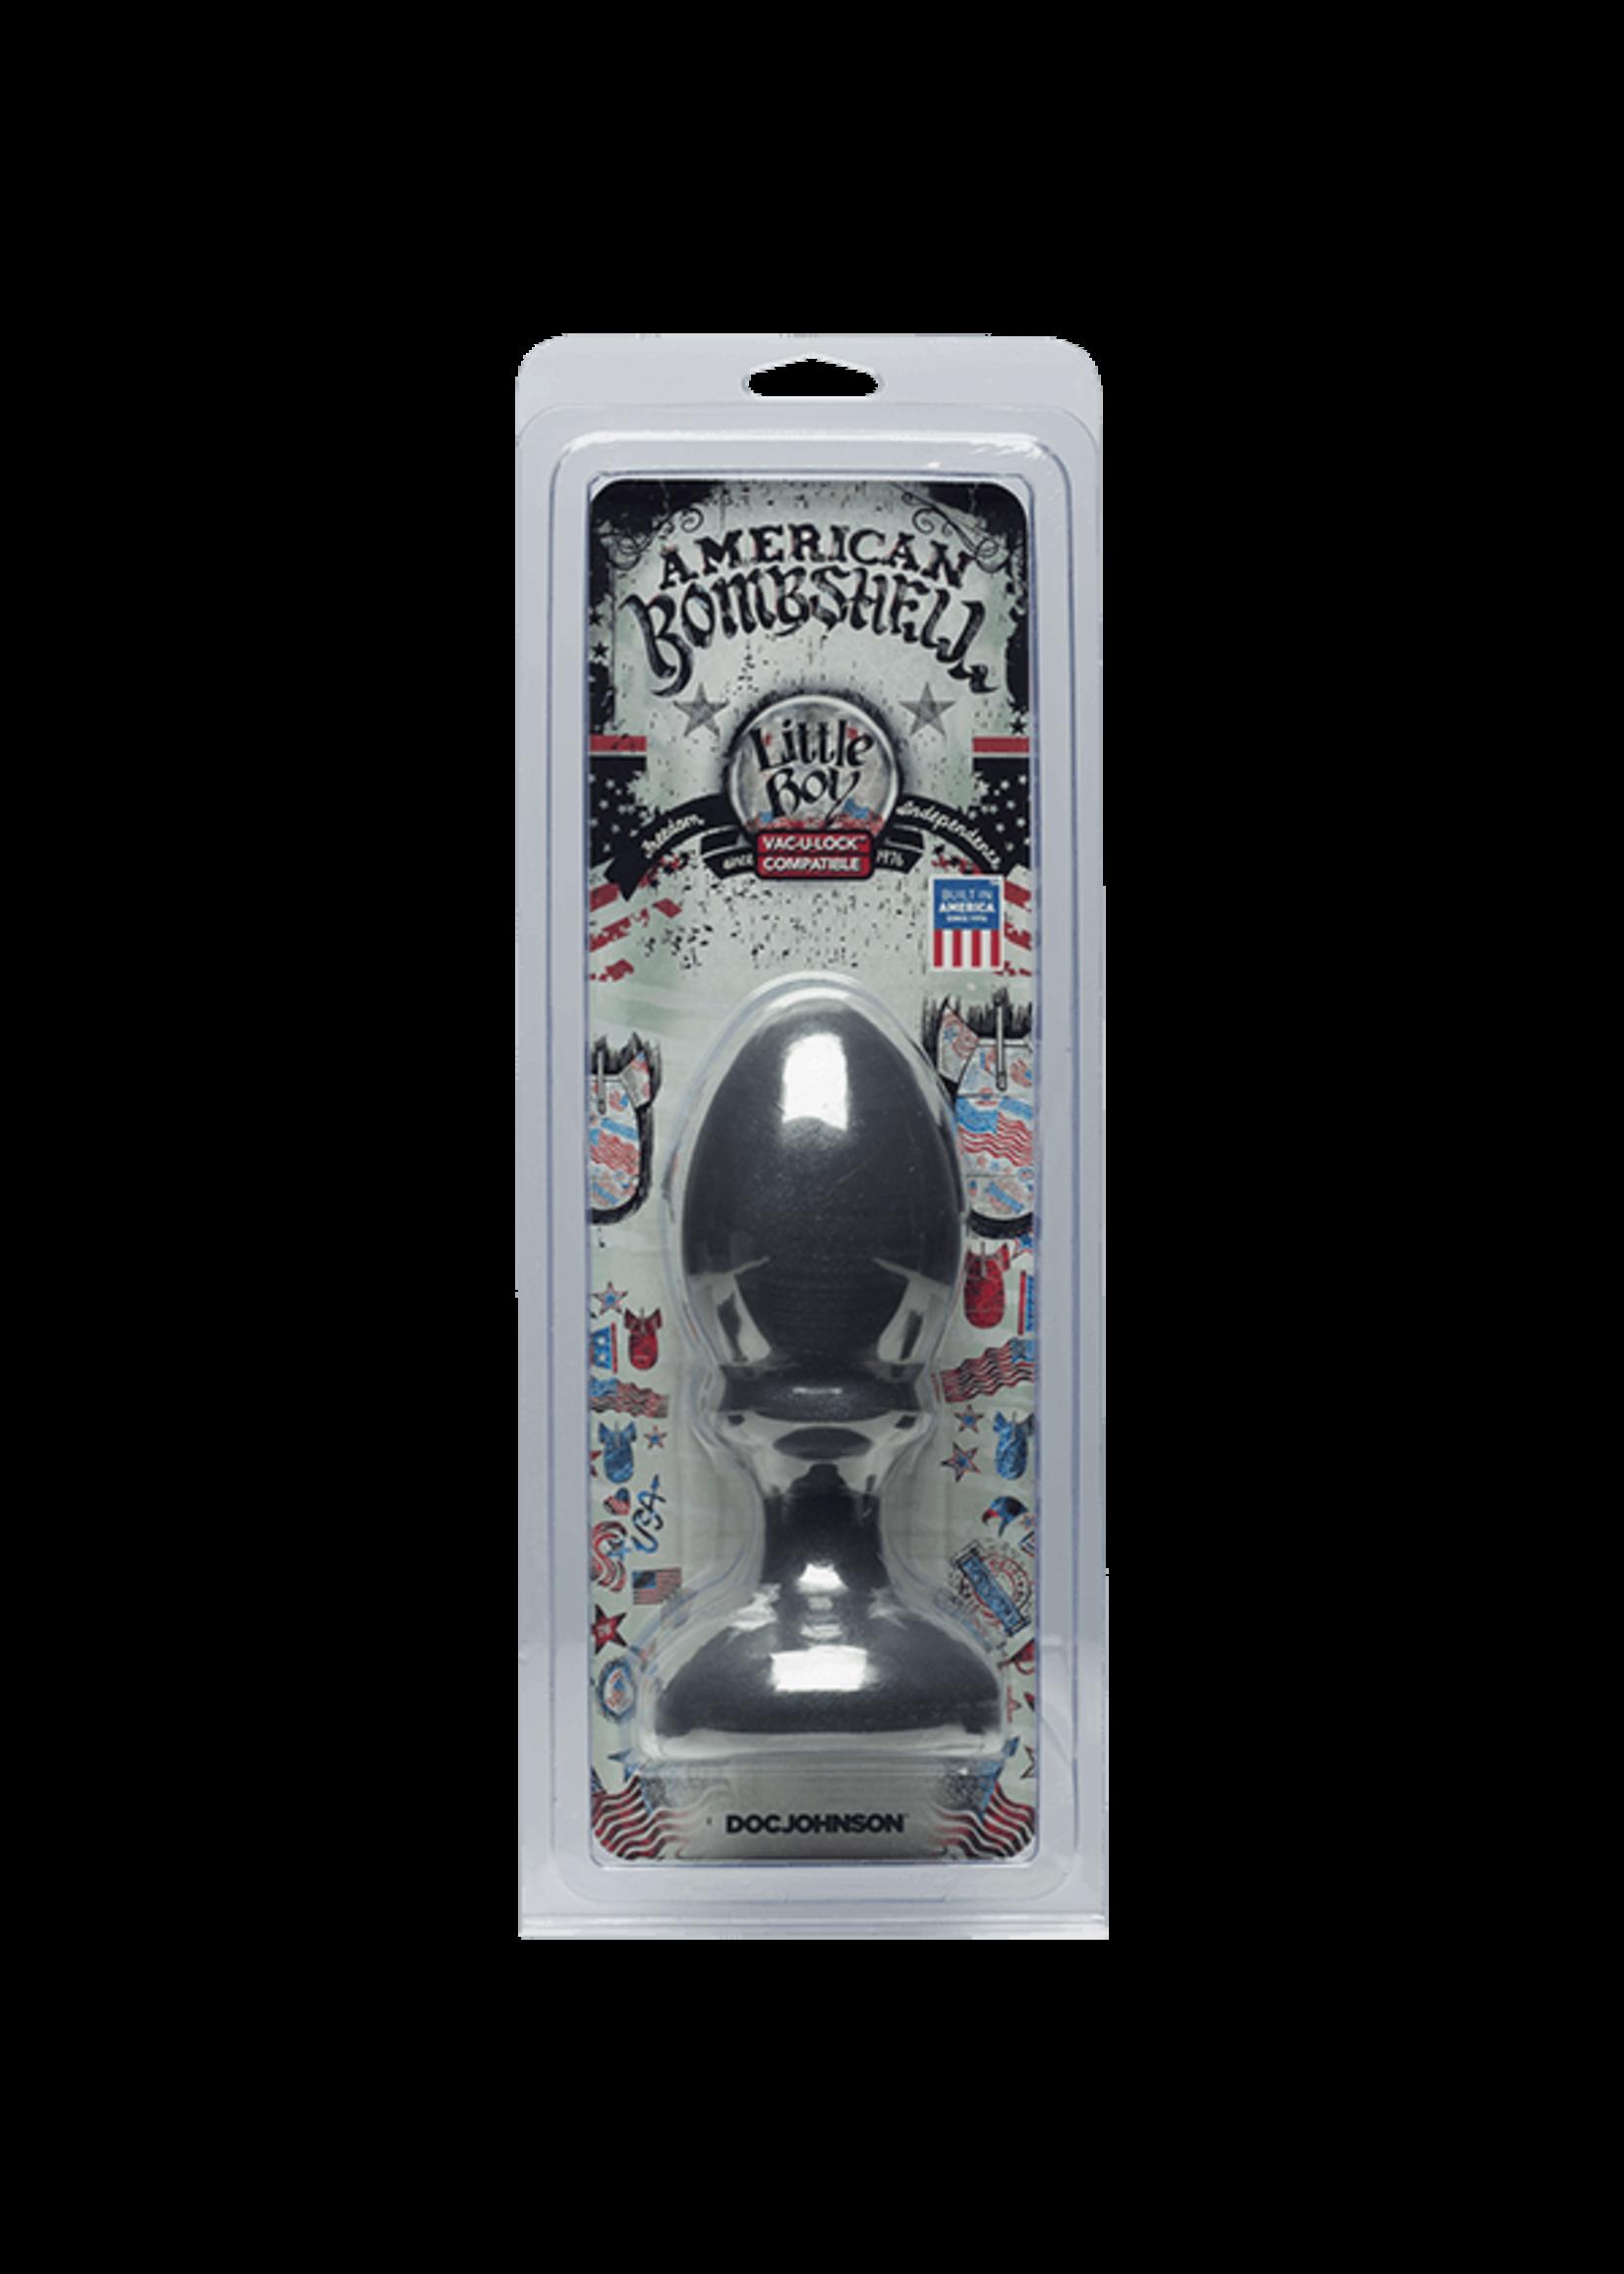 Doc Johnson American Bombshell-Little Boy Plug